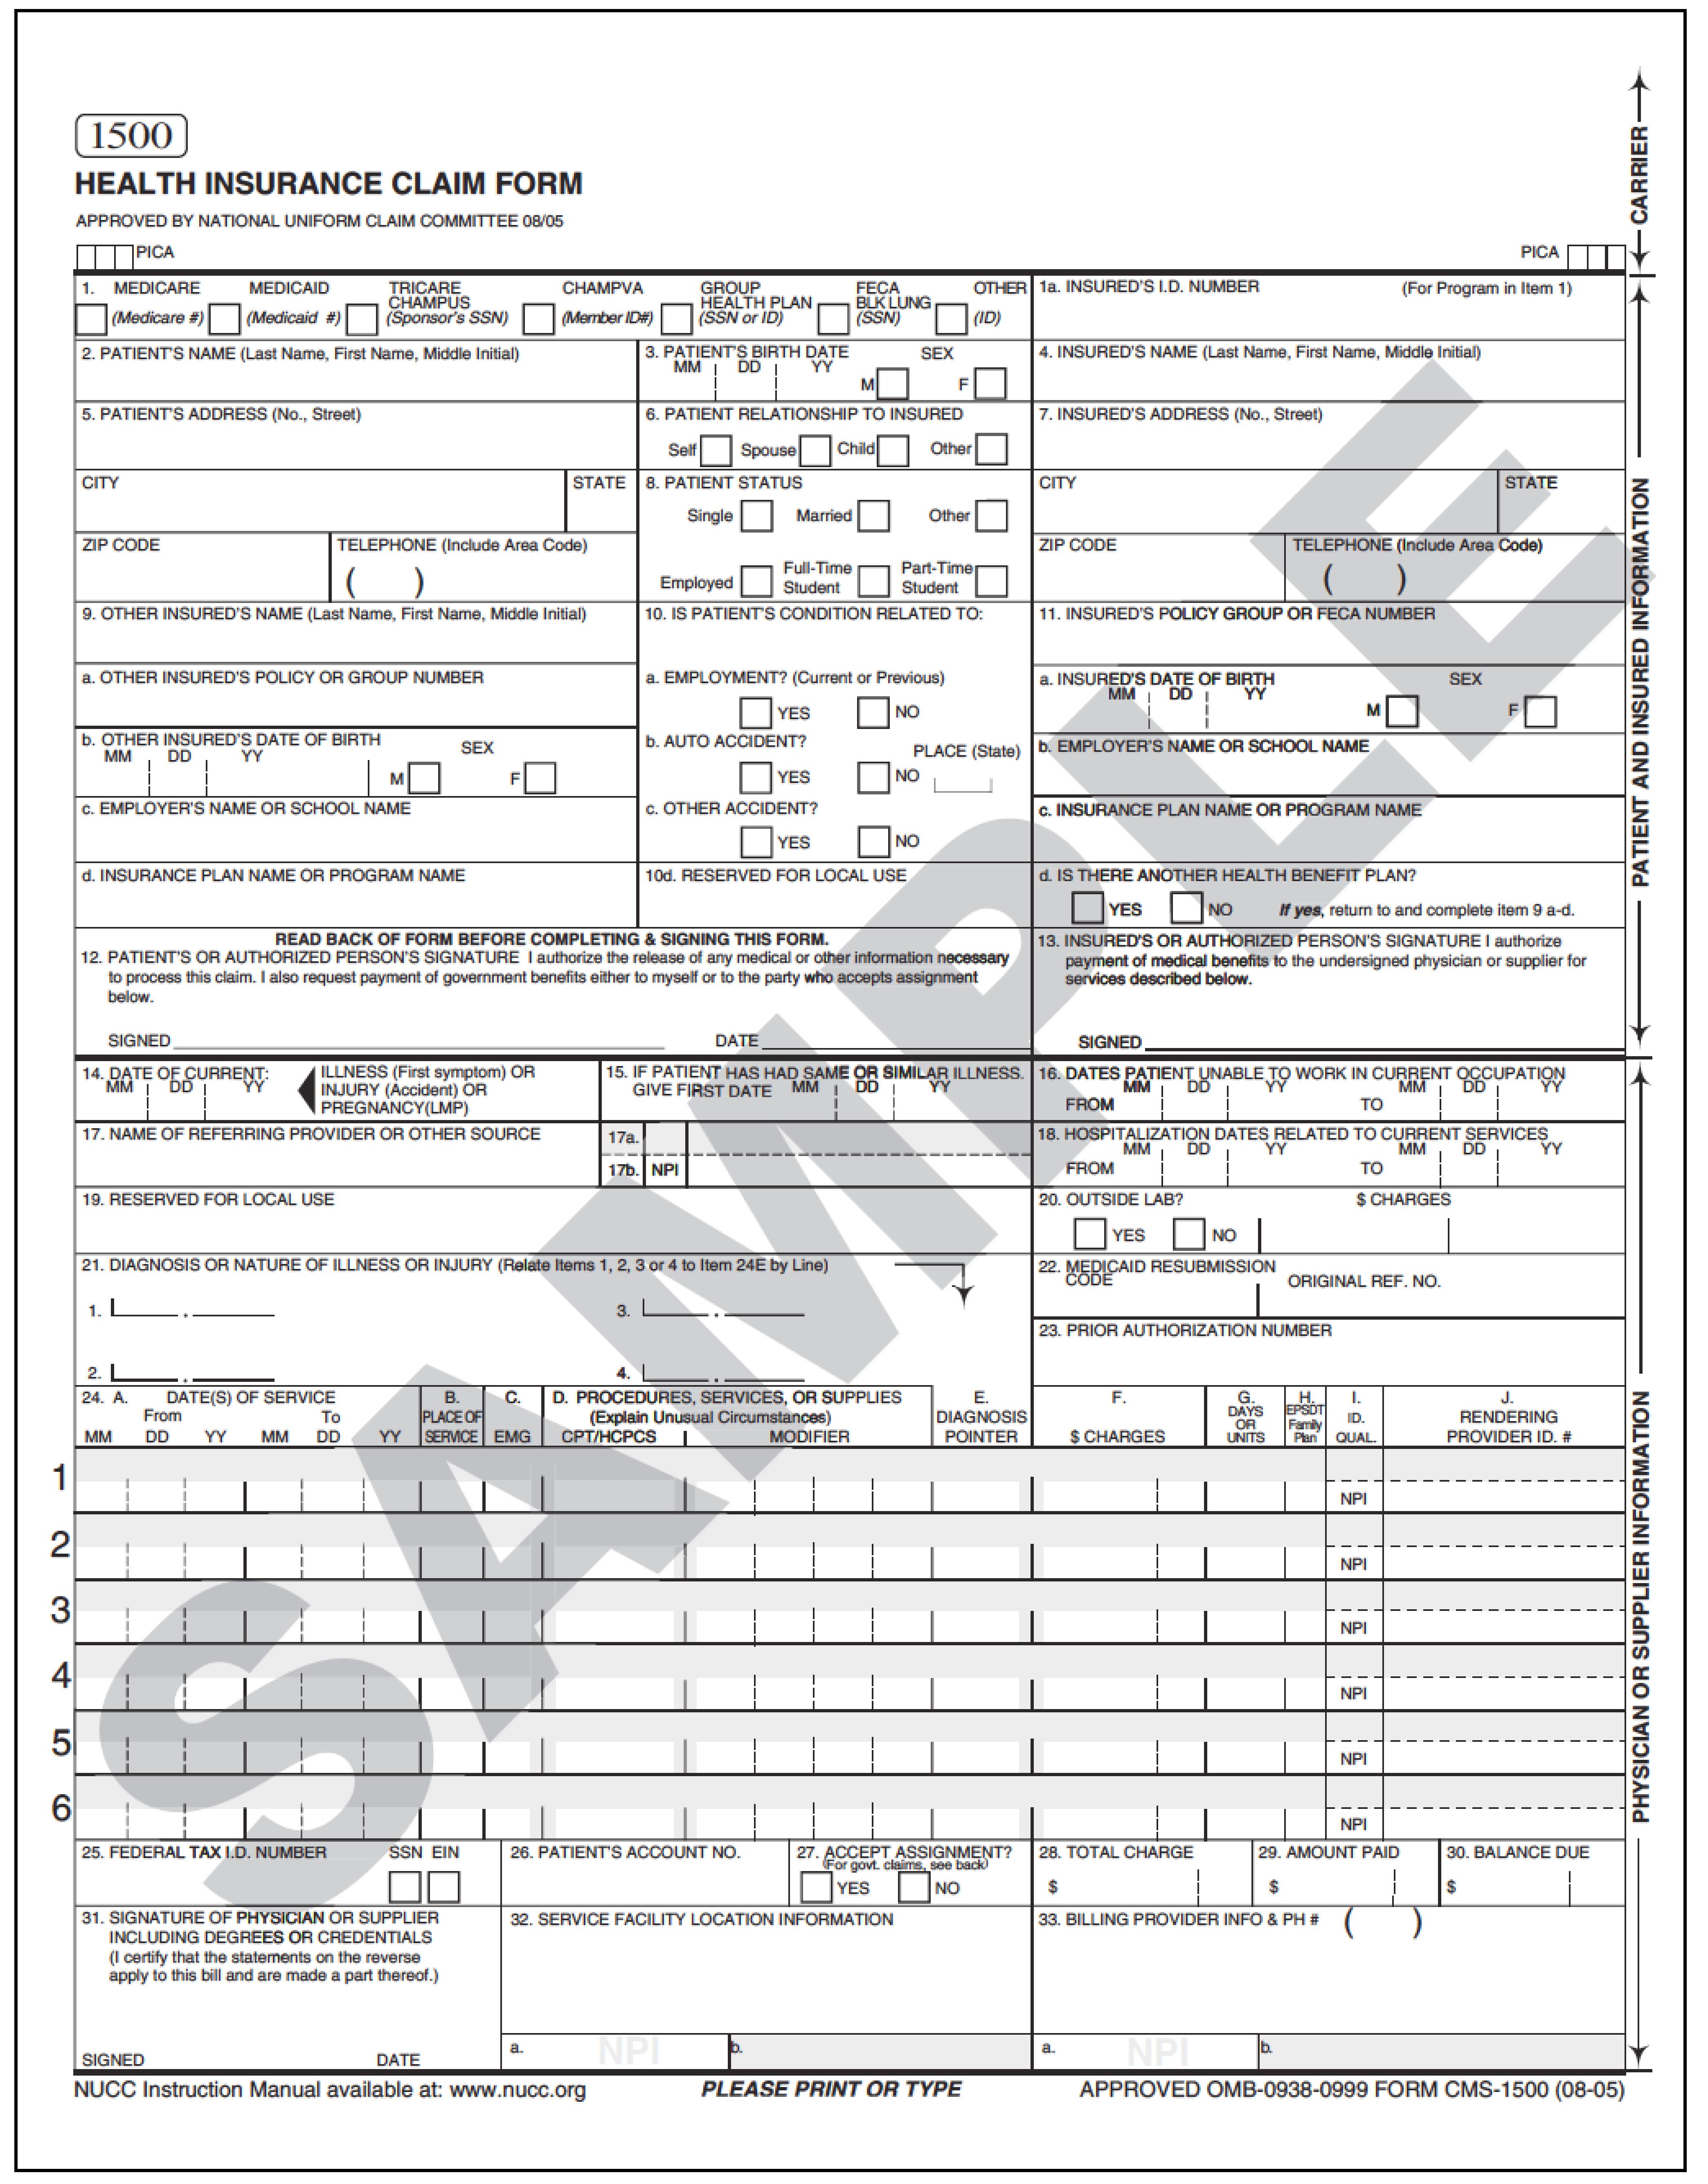 ea34c45a65fea2fb8dfc75556f991e42 - Medicaid Non Billing Provider Application